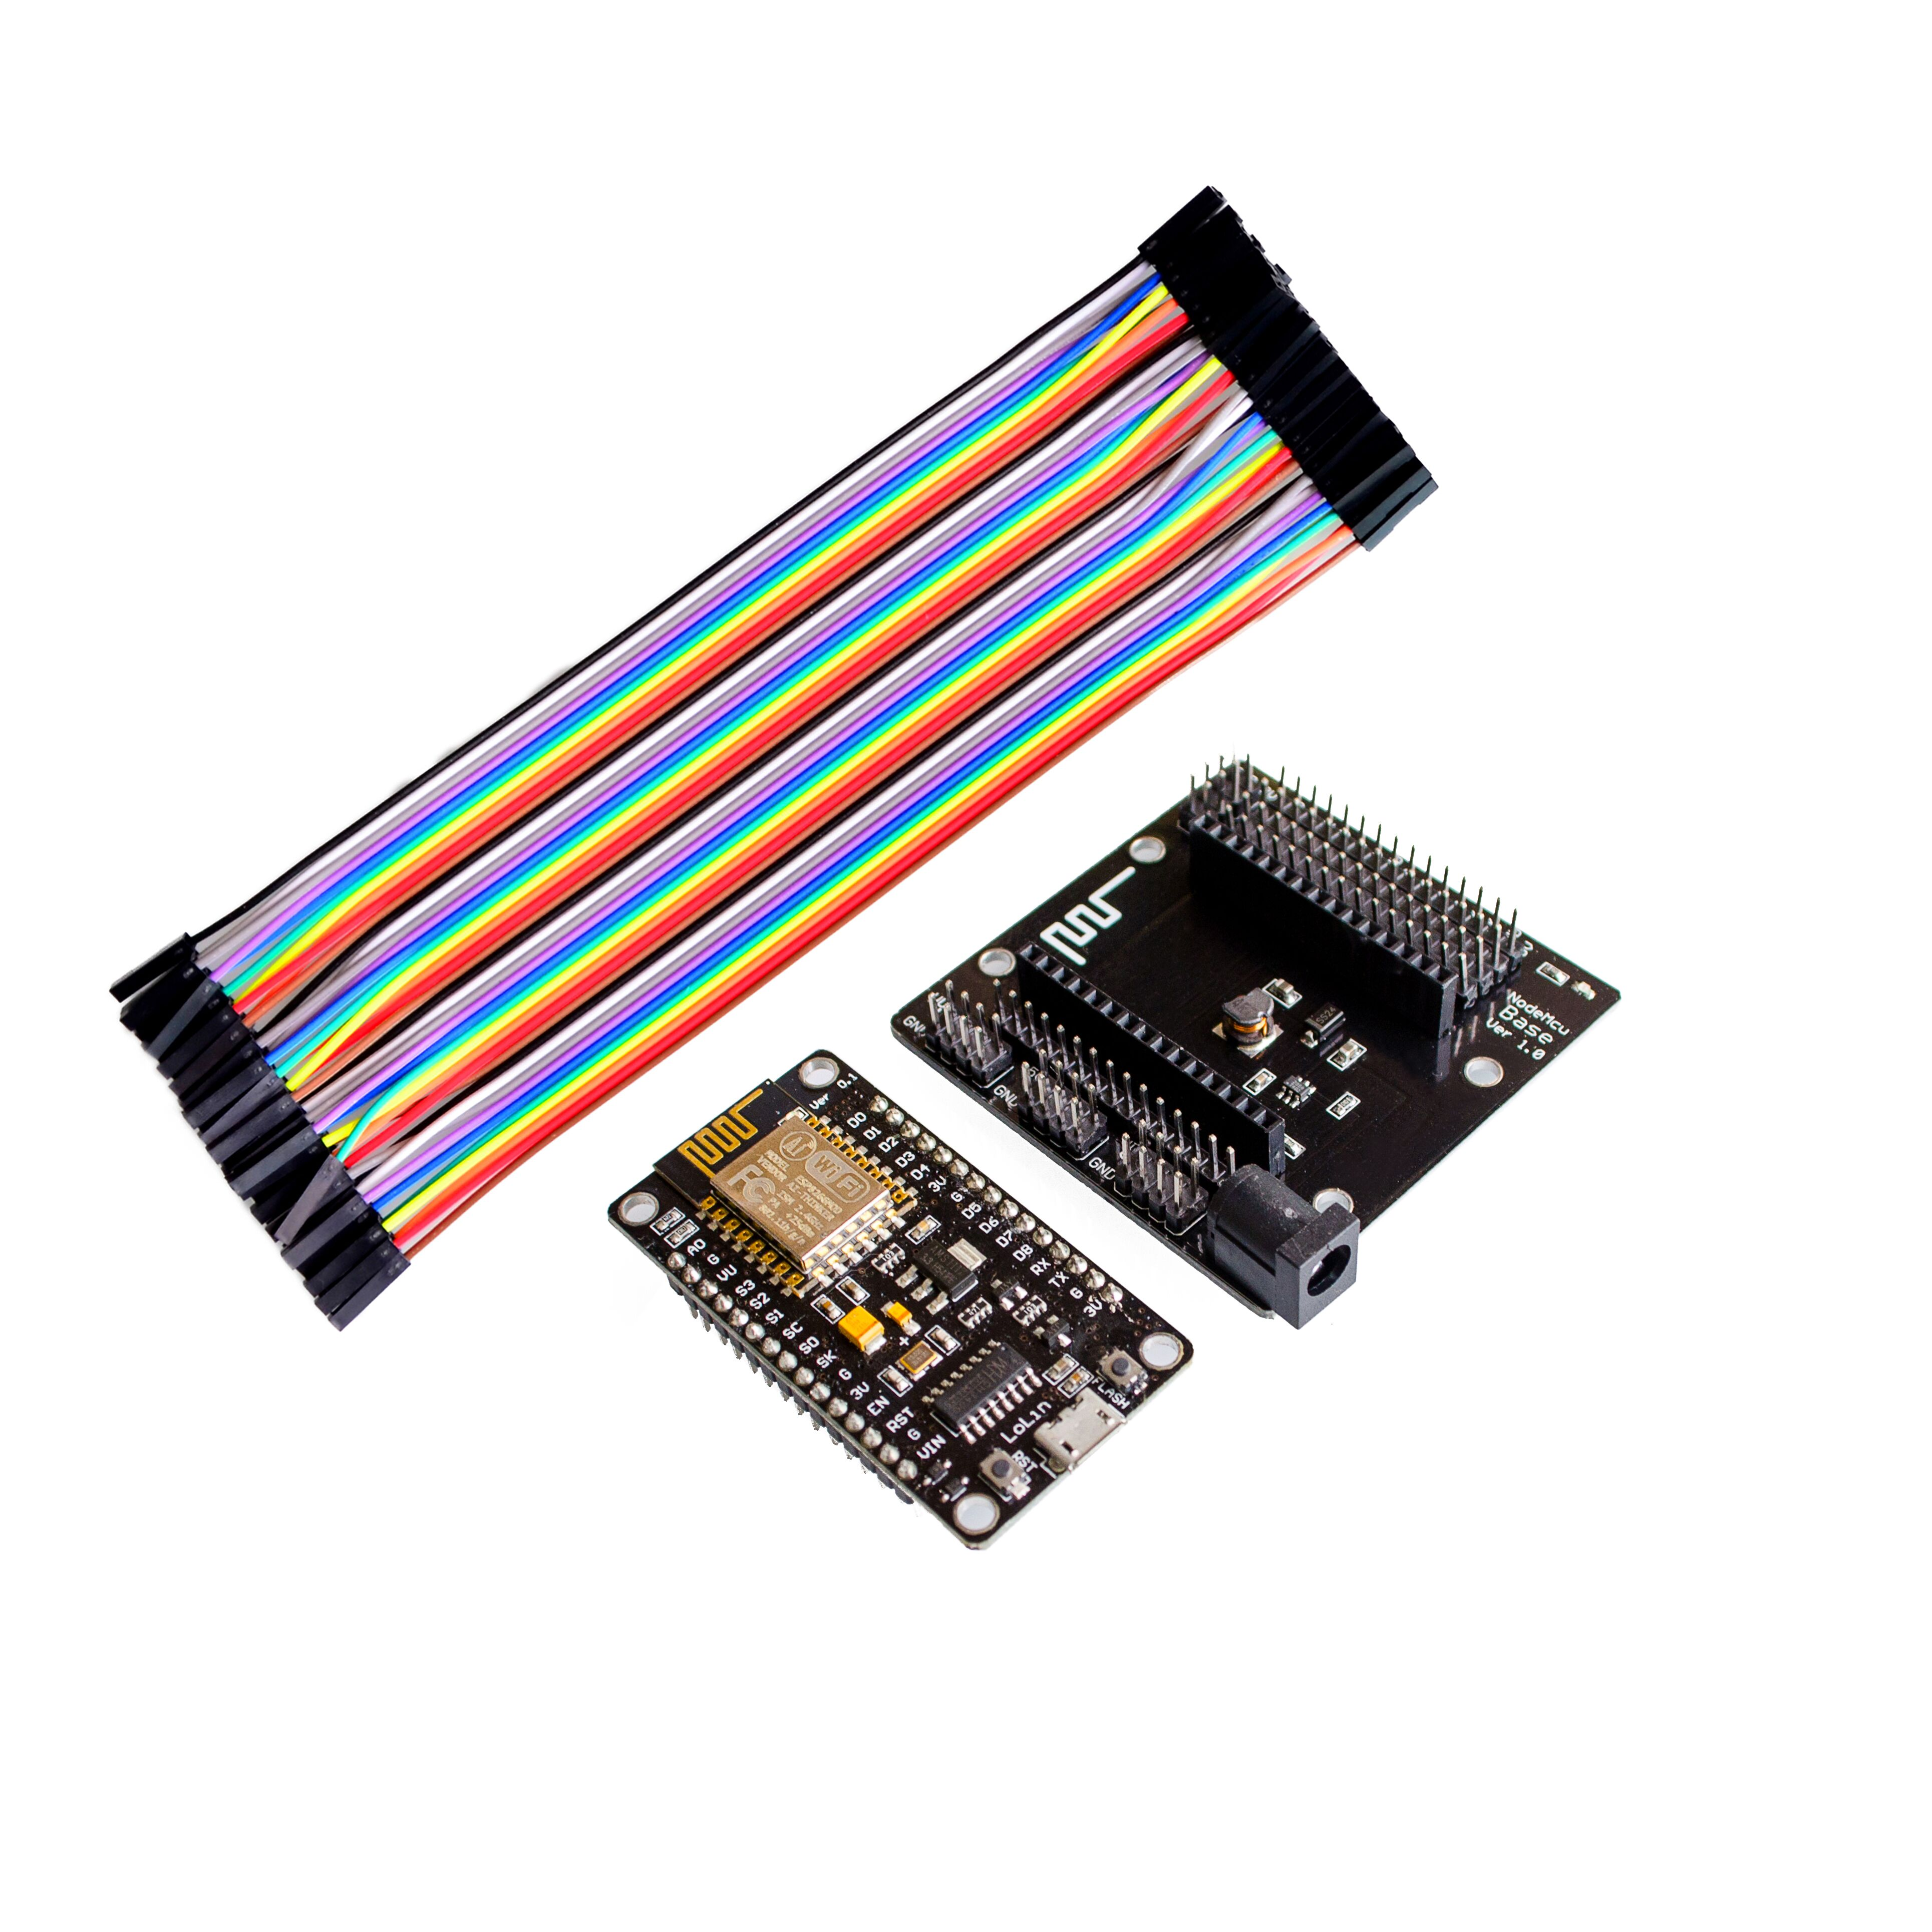 ESP8266 kit NodeMcu + NodeMcu base + 40P wires testing DIY Breadboard